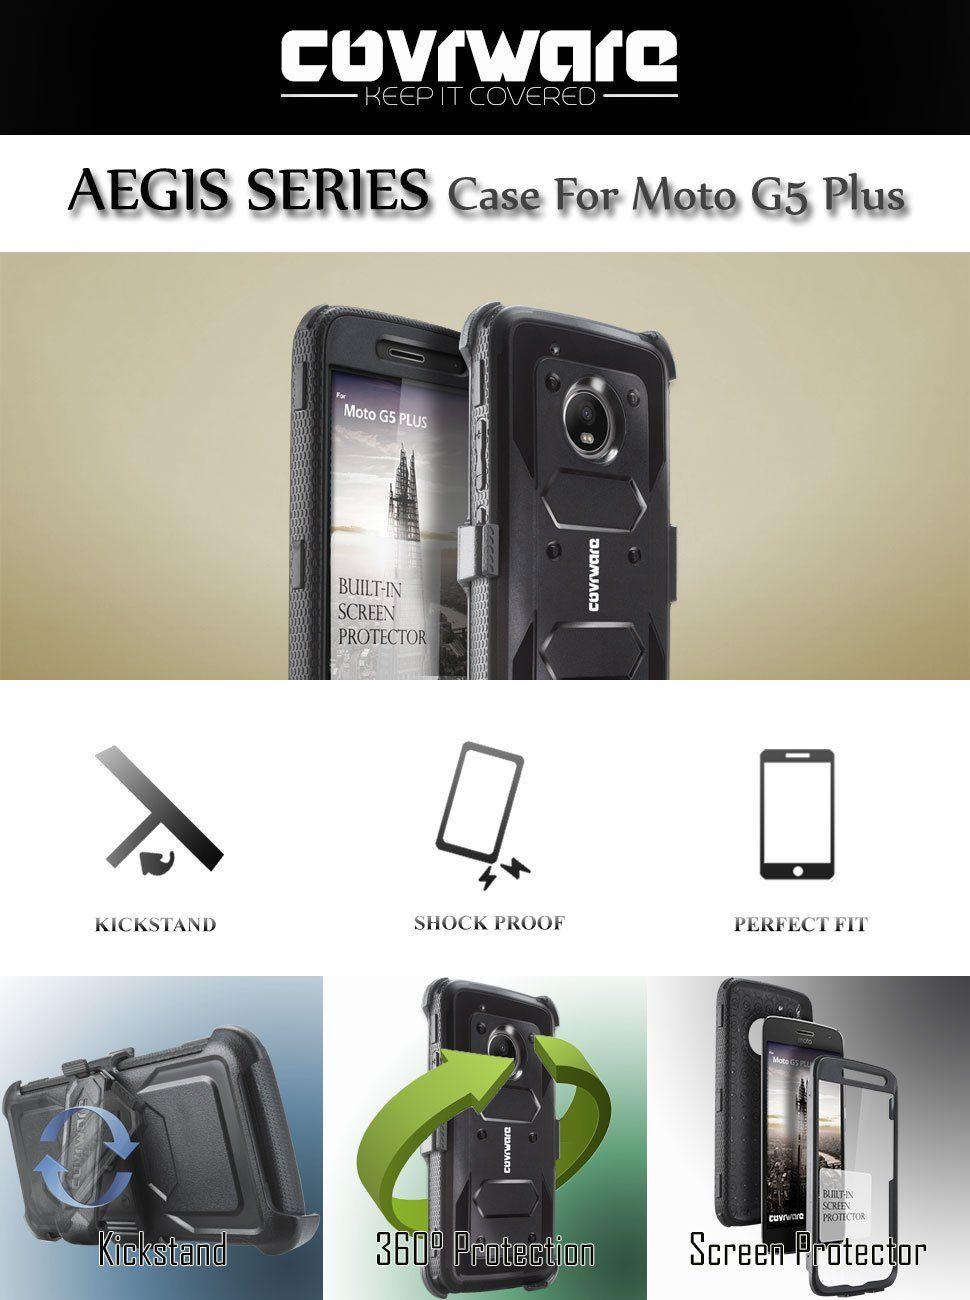 factory authentic f5dbe 46a2d Amazon.com: Moto G5 Plus Case, COVRWARE [Aegis Series] w/ Built-in ...